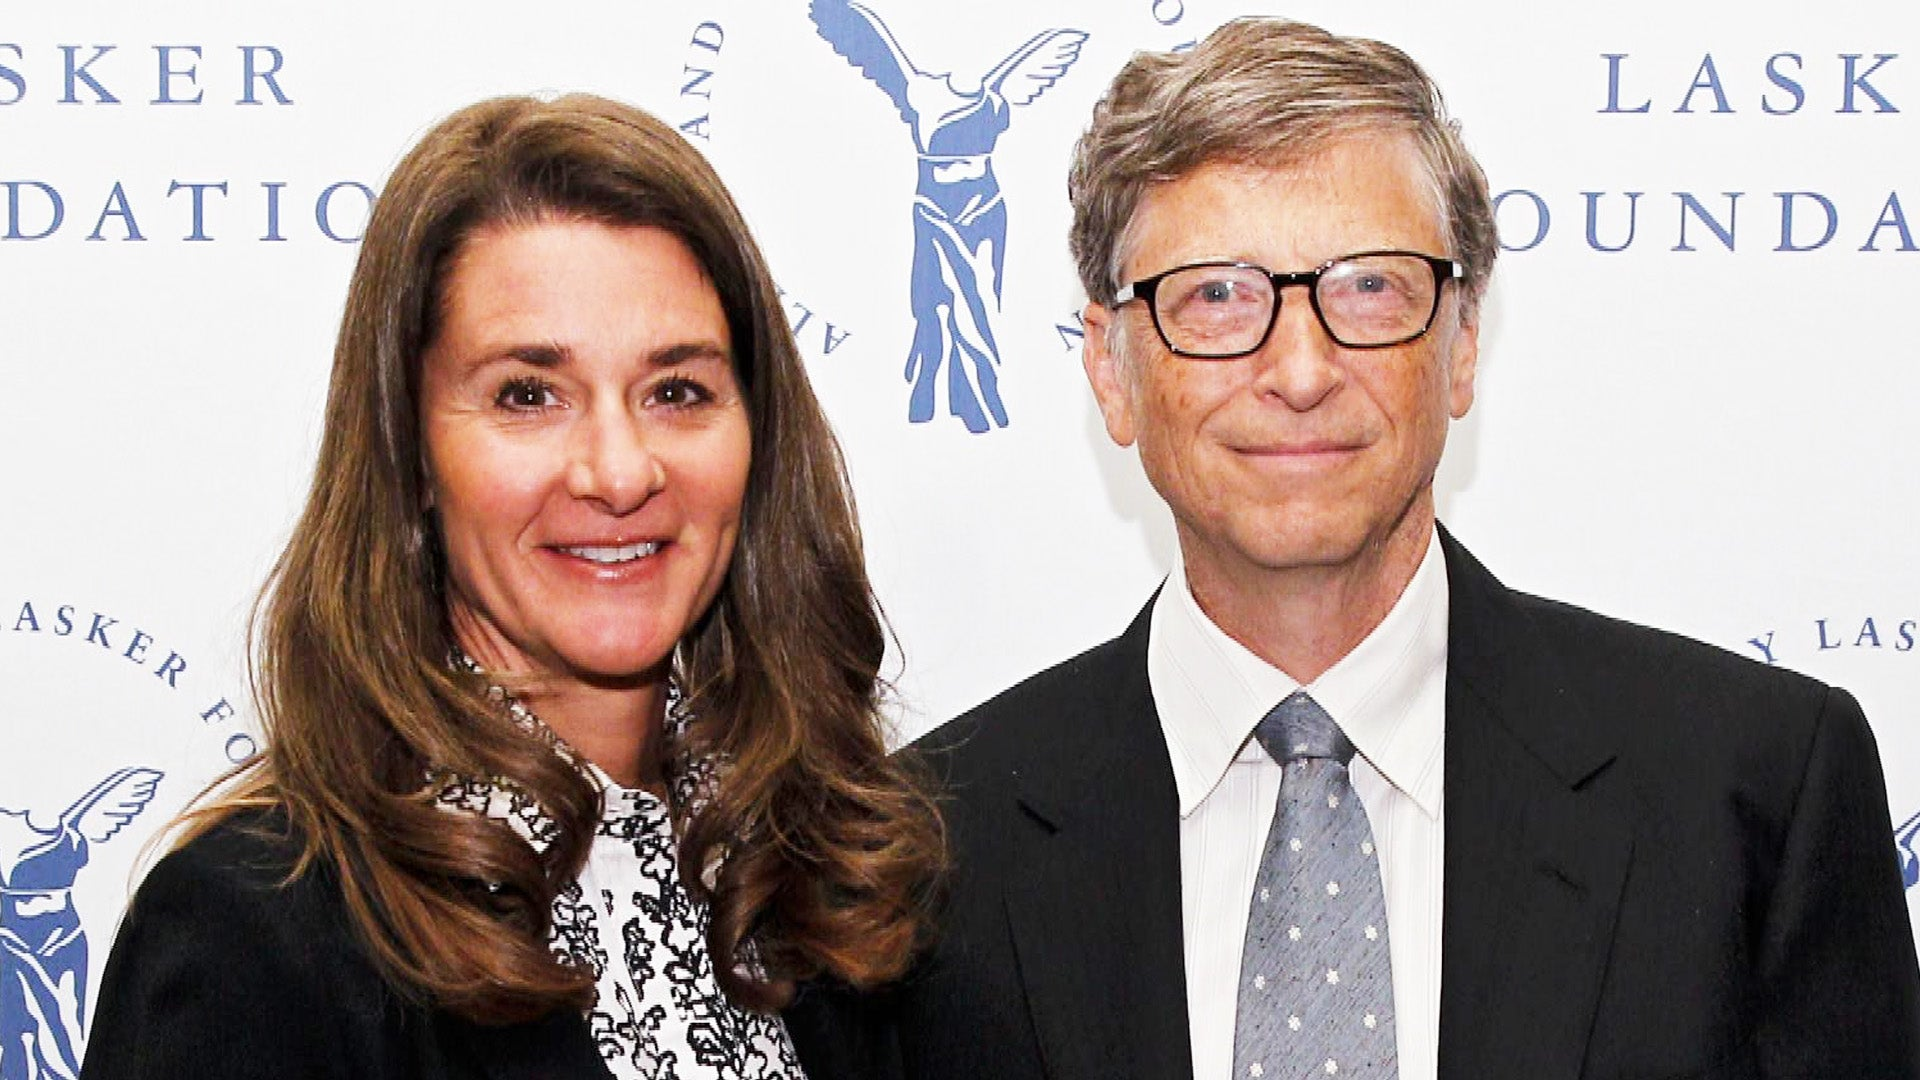 Bill and Melinda Gates' $1.8 Billion Split: What Led to the Couple's Divorce